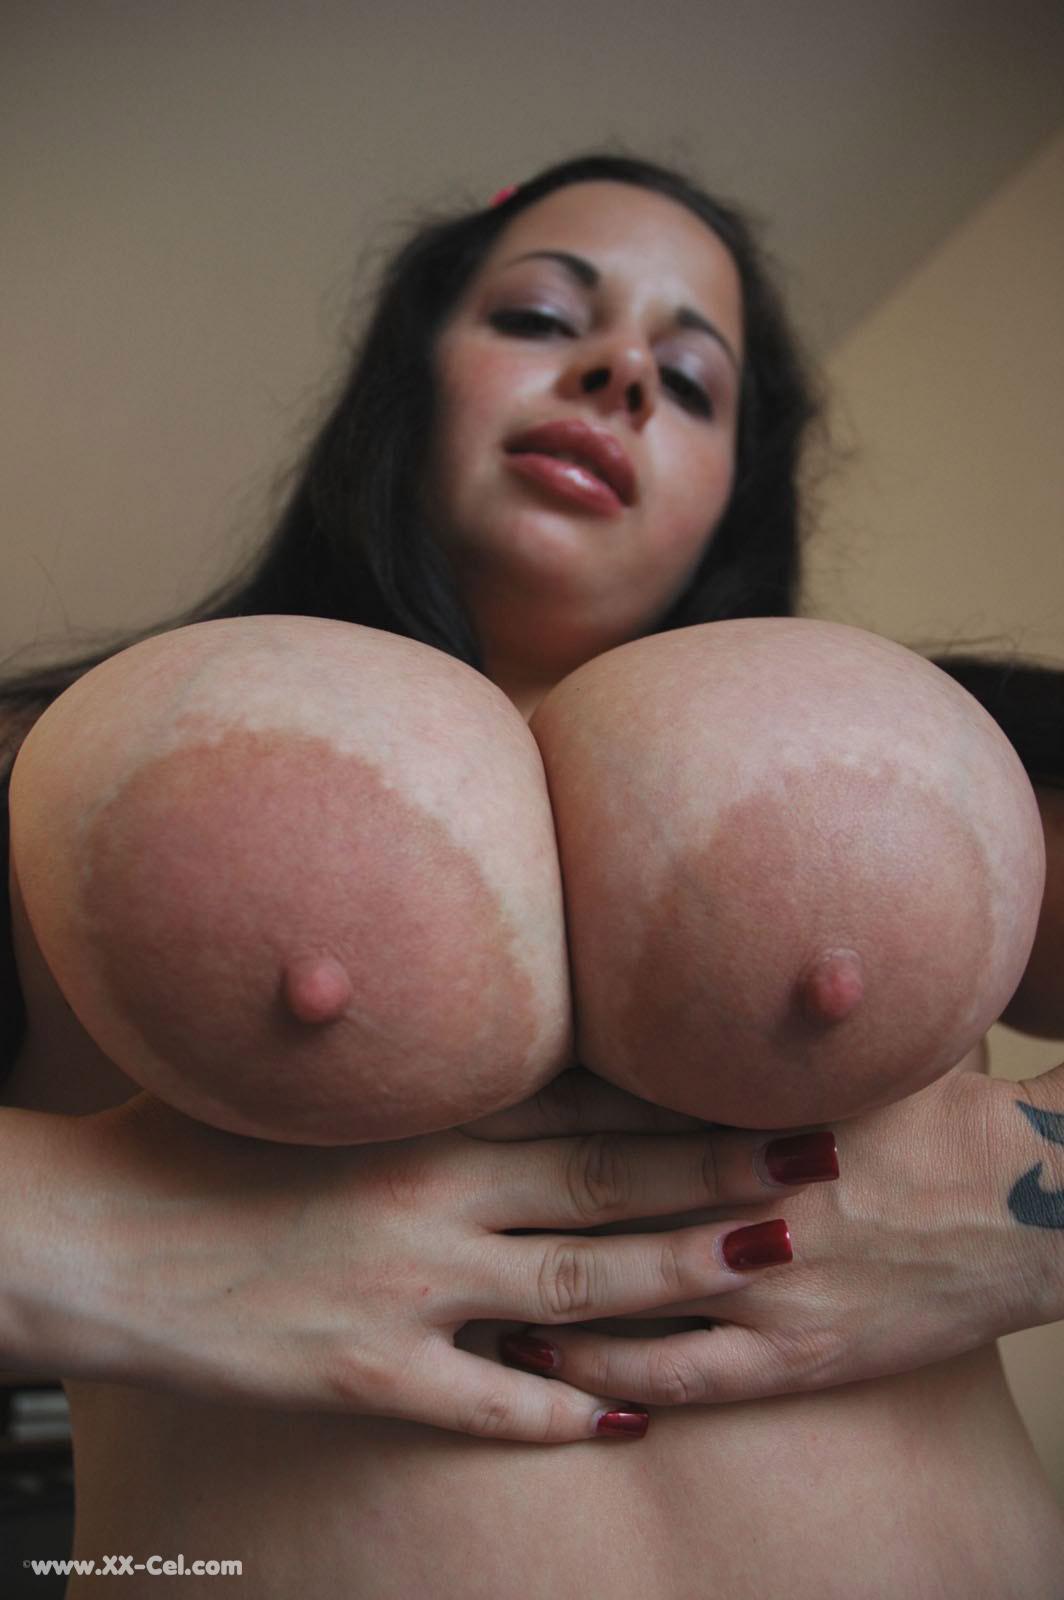 Big tits news